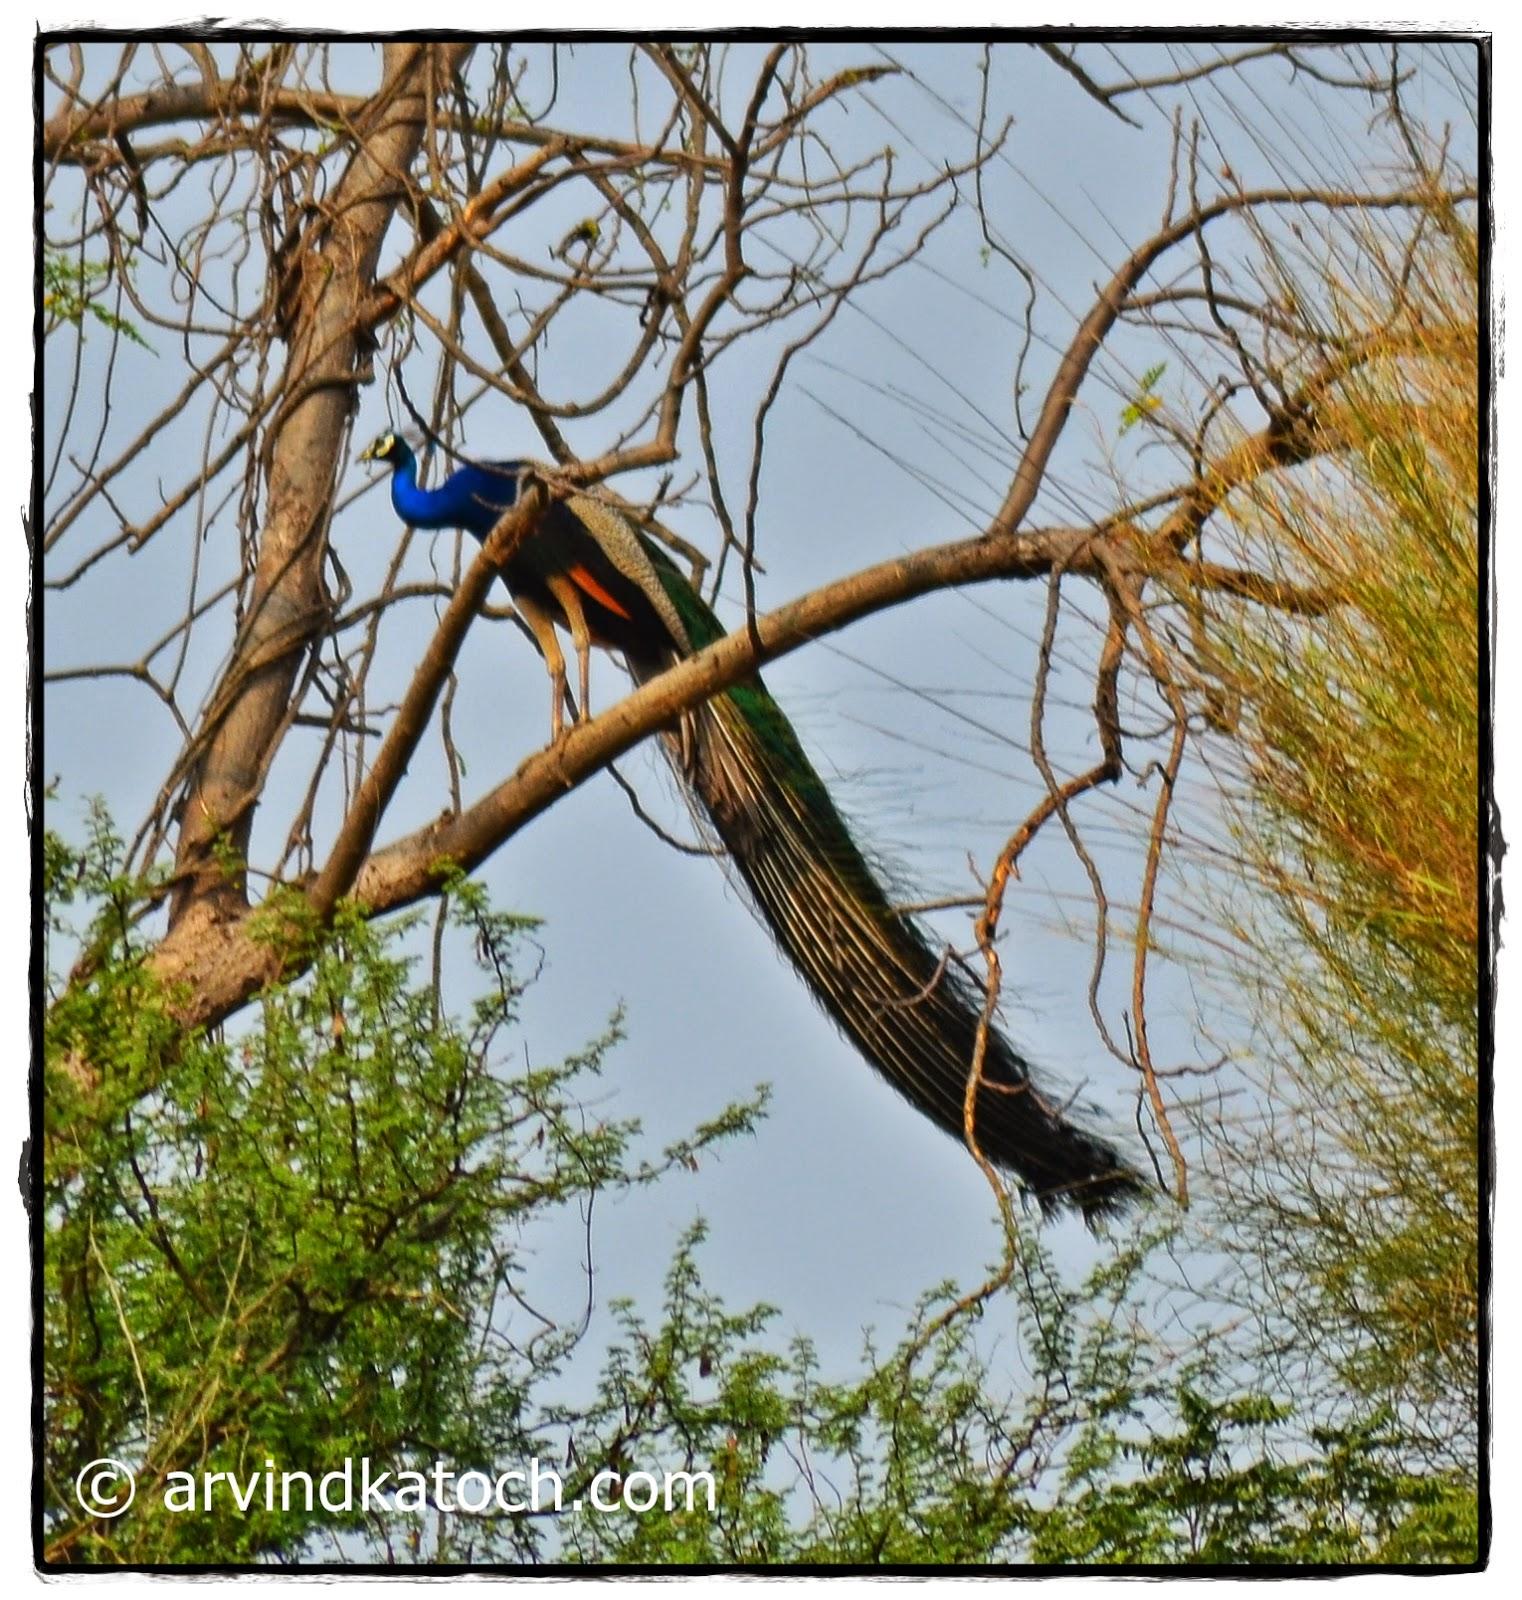 Peacock, Tree,